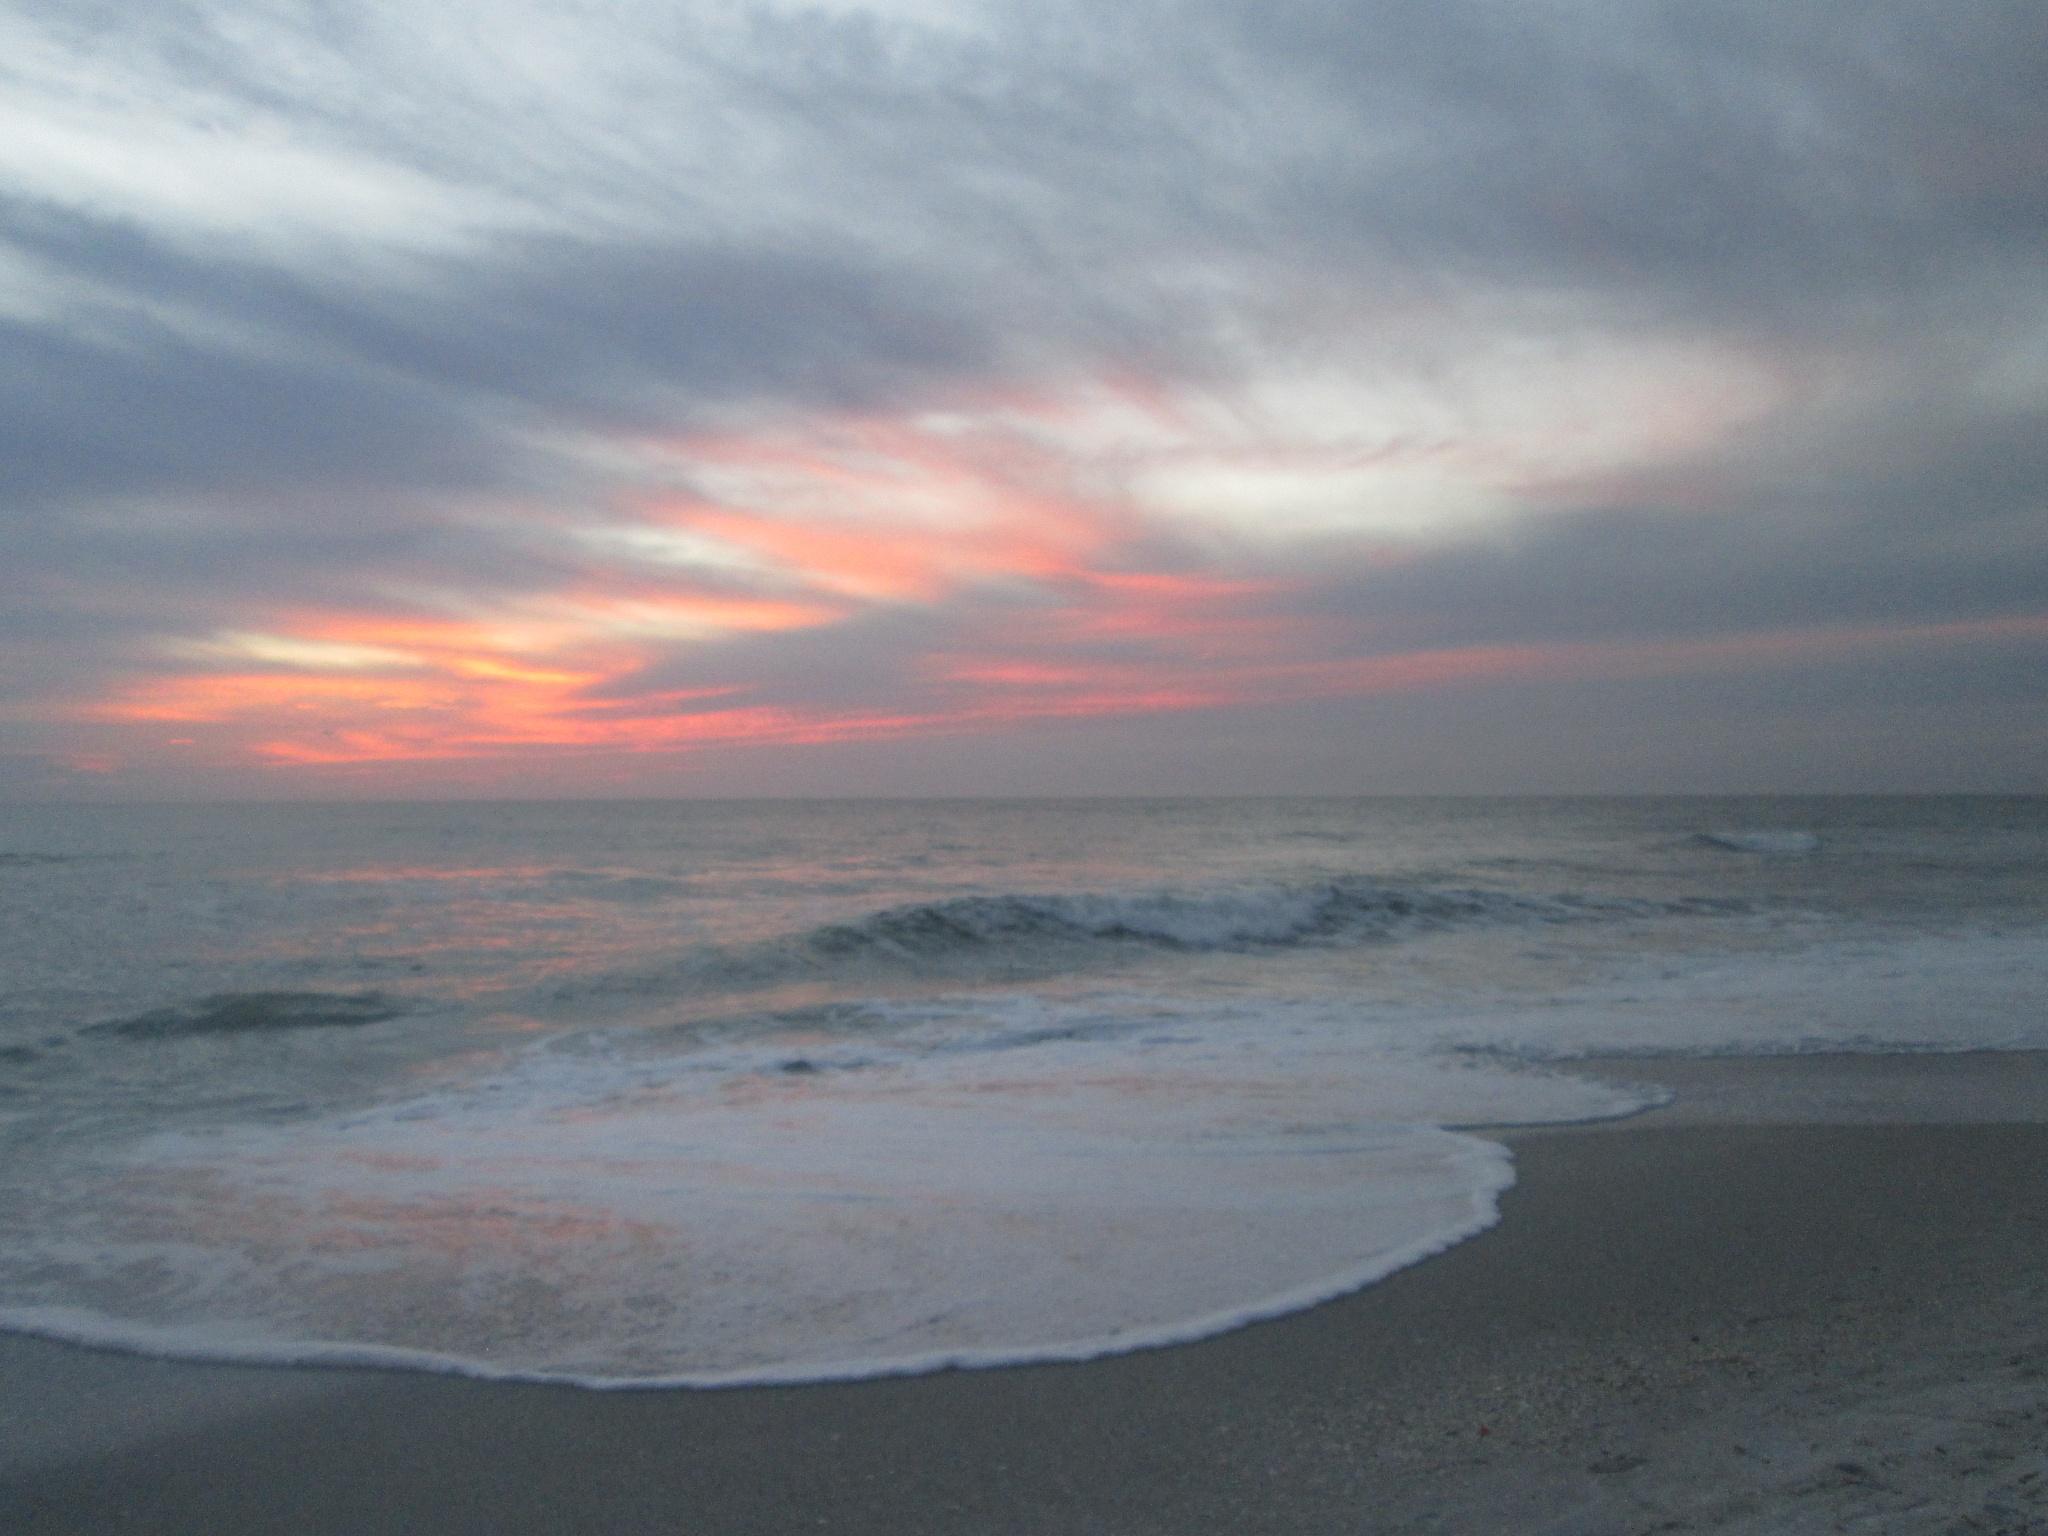 pink sky at night, sailors delight by pamela.kanarr